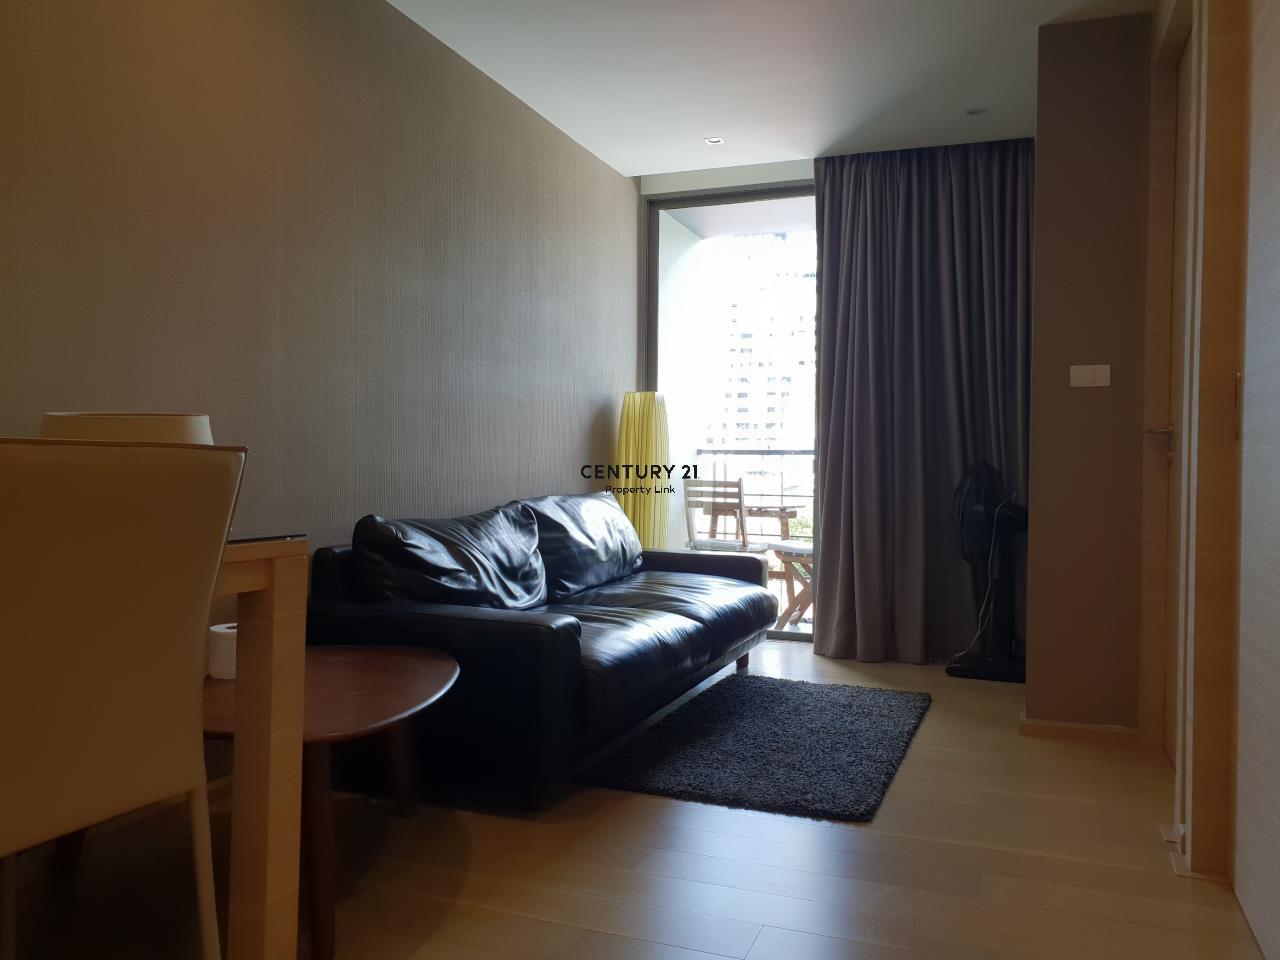 Century21 Property Link Agency's 32-CC-61473 Klass Silom 4